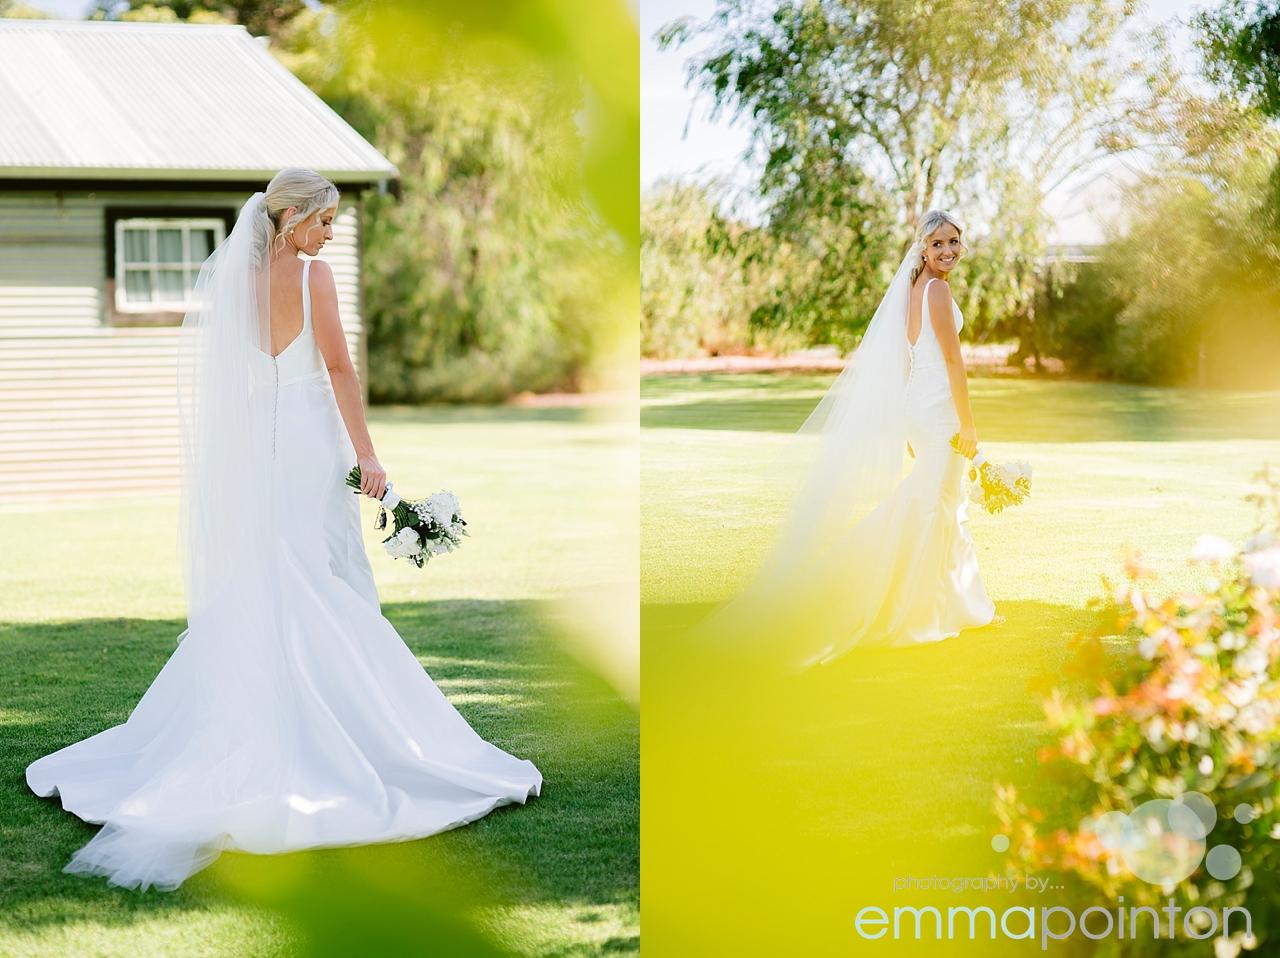 Old_Broadwater_Farm_Wedding_064.jpg